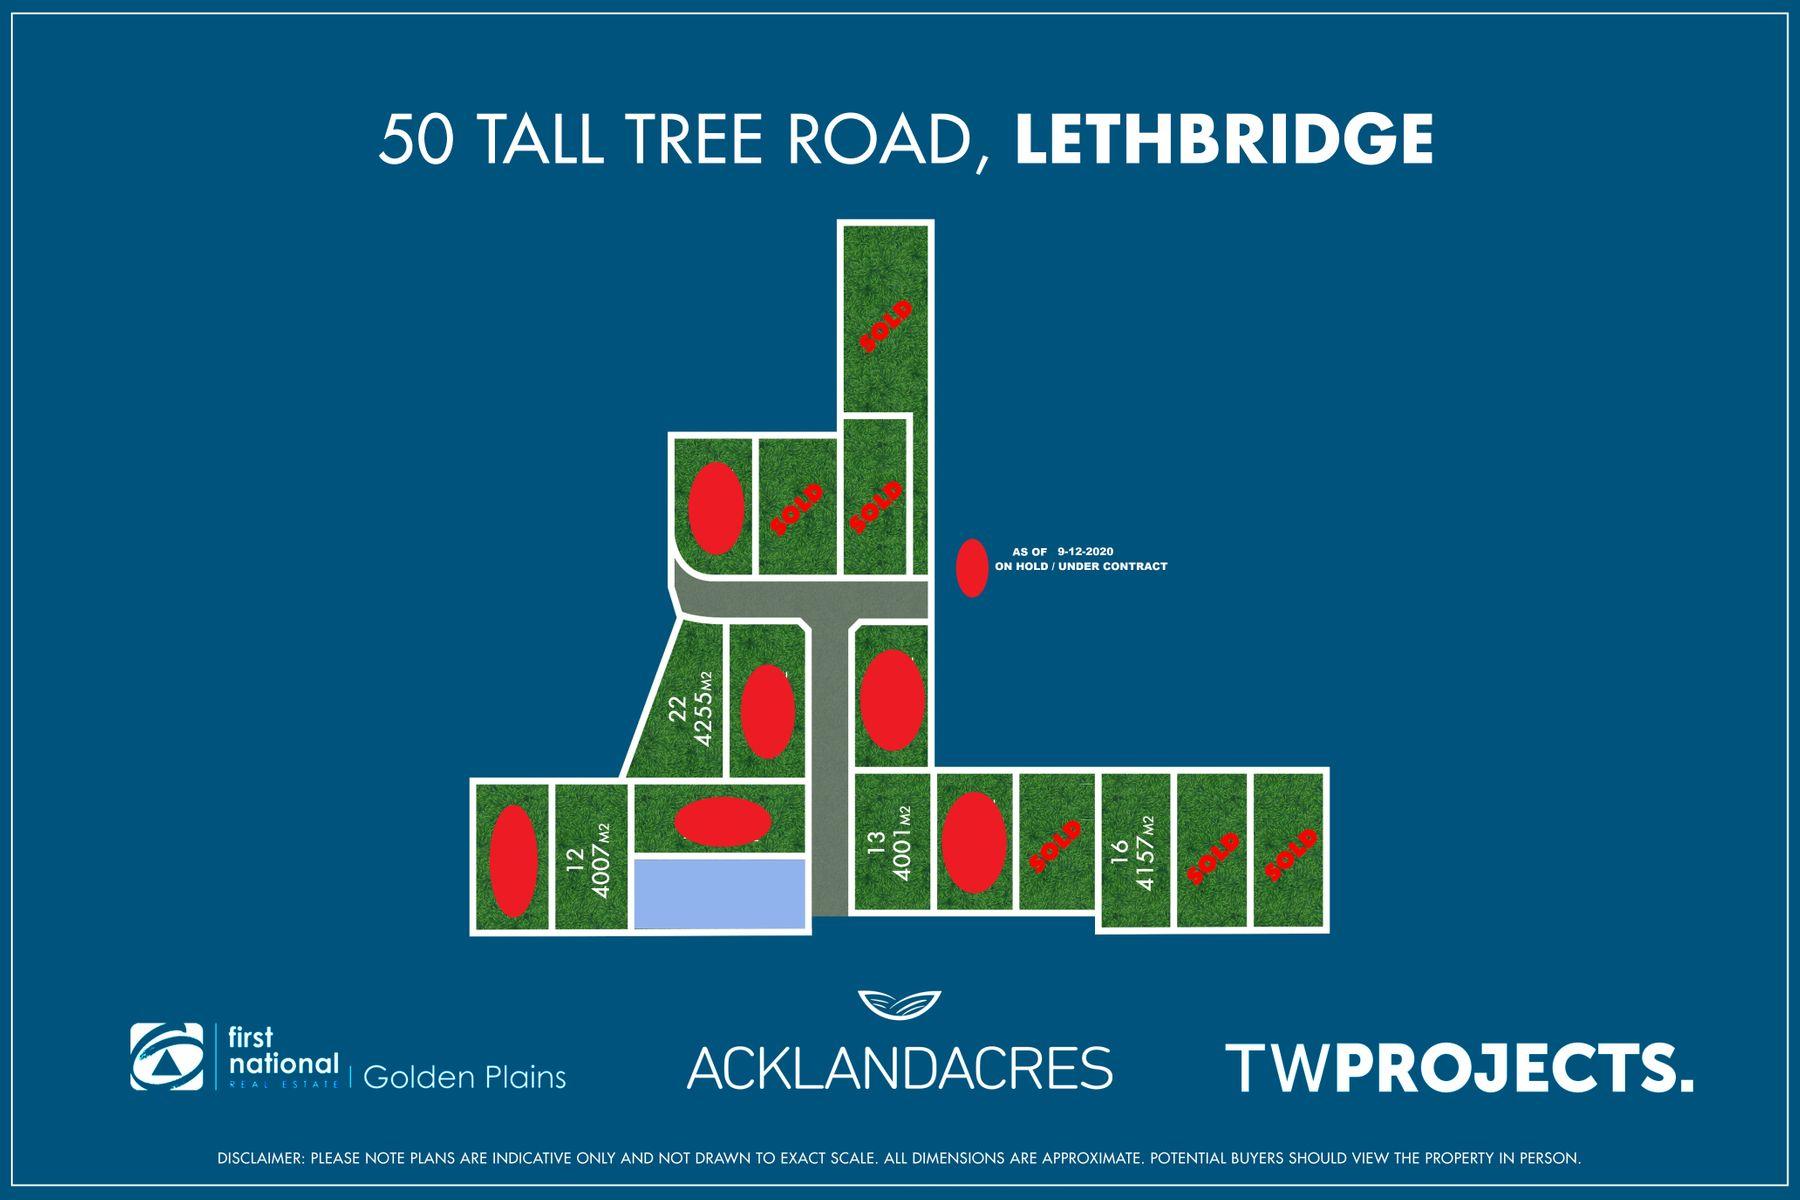 Lot 15, 50 Tall Tree Road, Lethbridge, VIC 3332